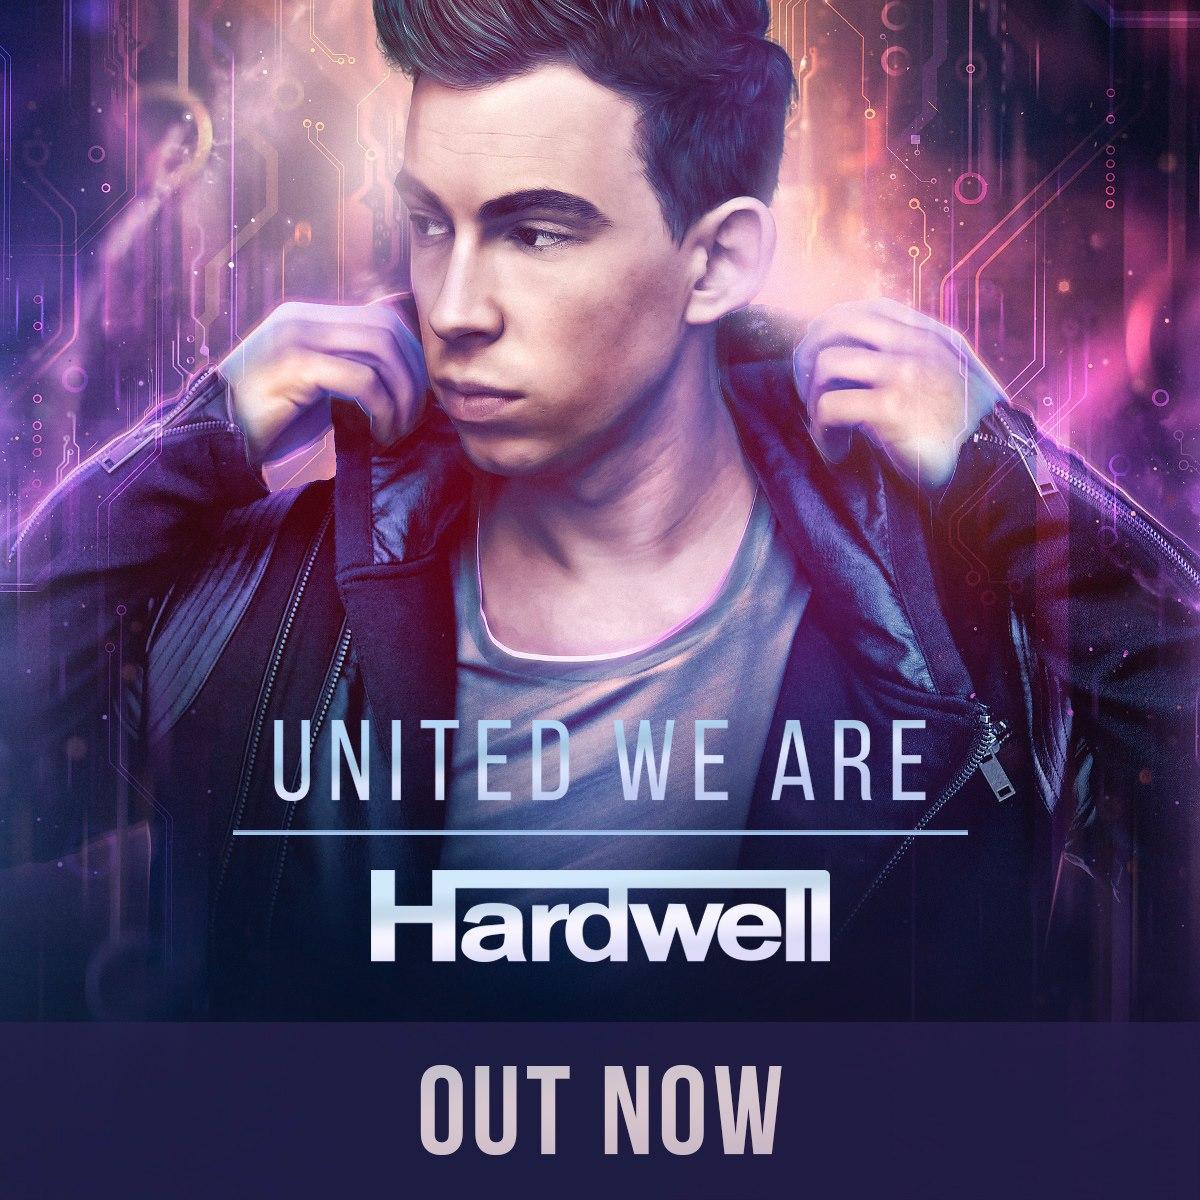 hardwell-united-we-are